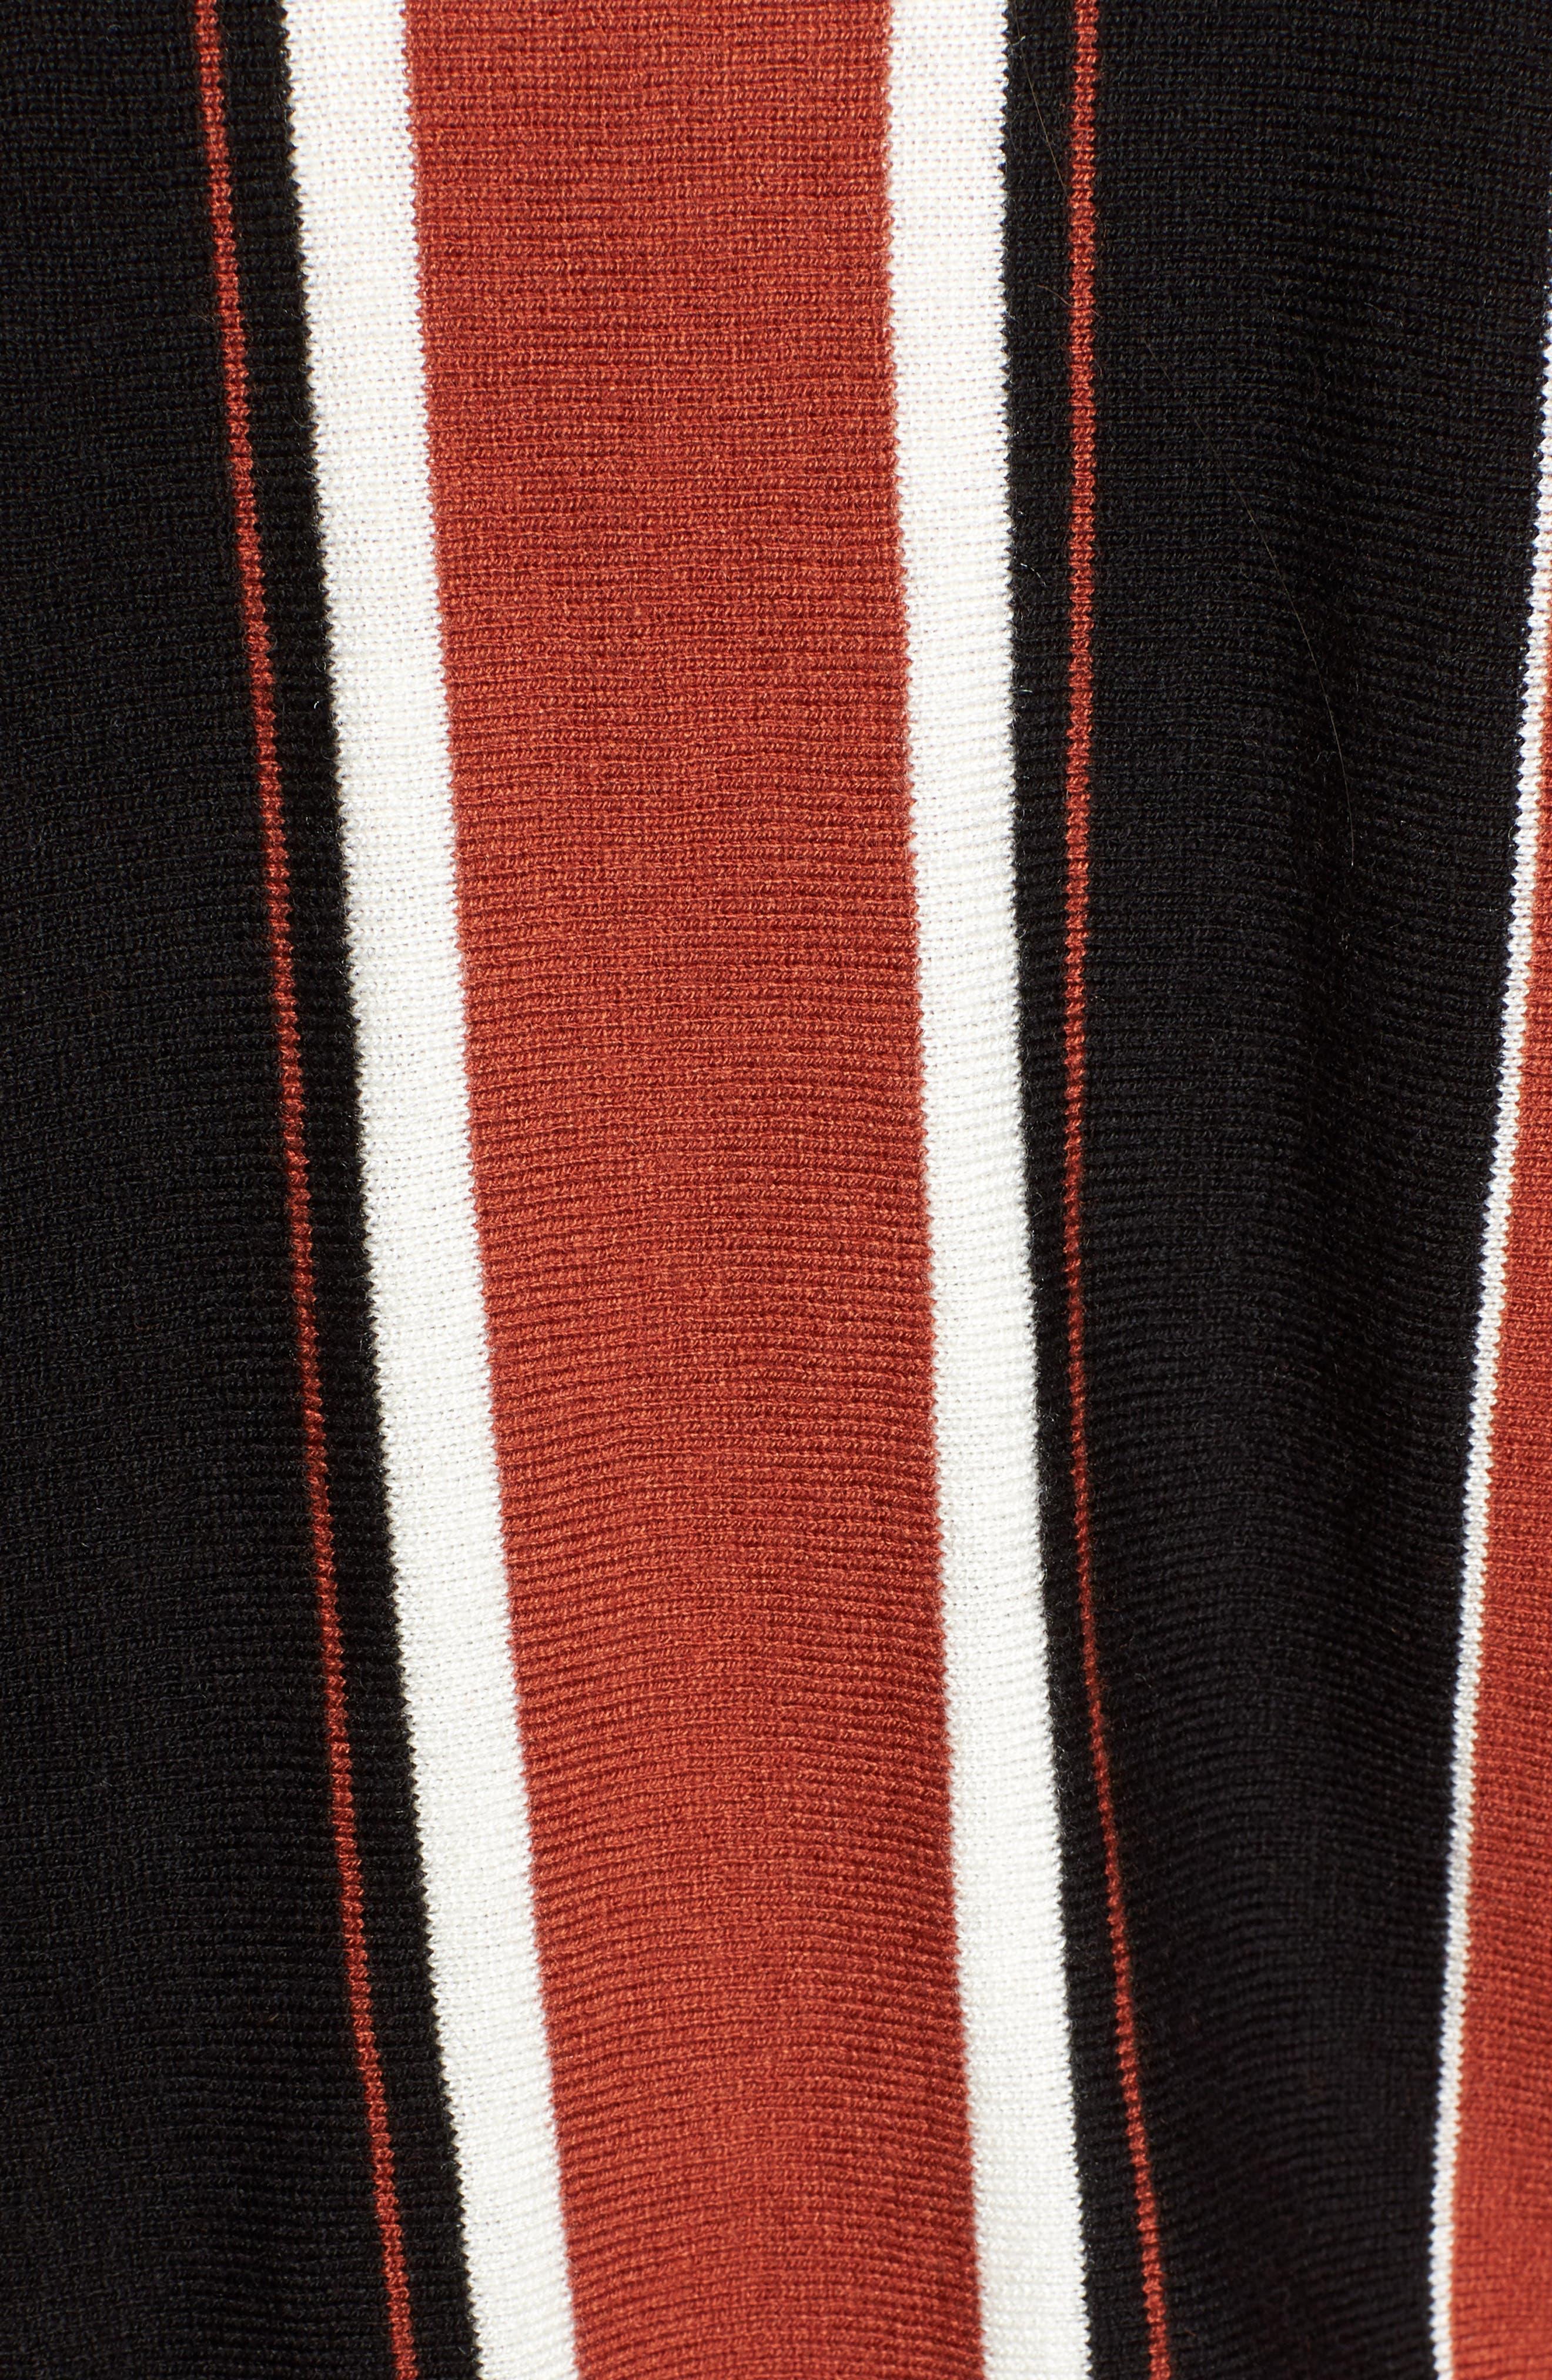 Stripe Dolman Sleeve Sweater,                             Alternate thumbnail 6, color,                             210